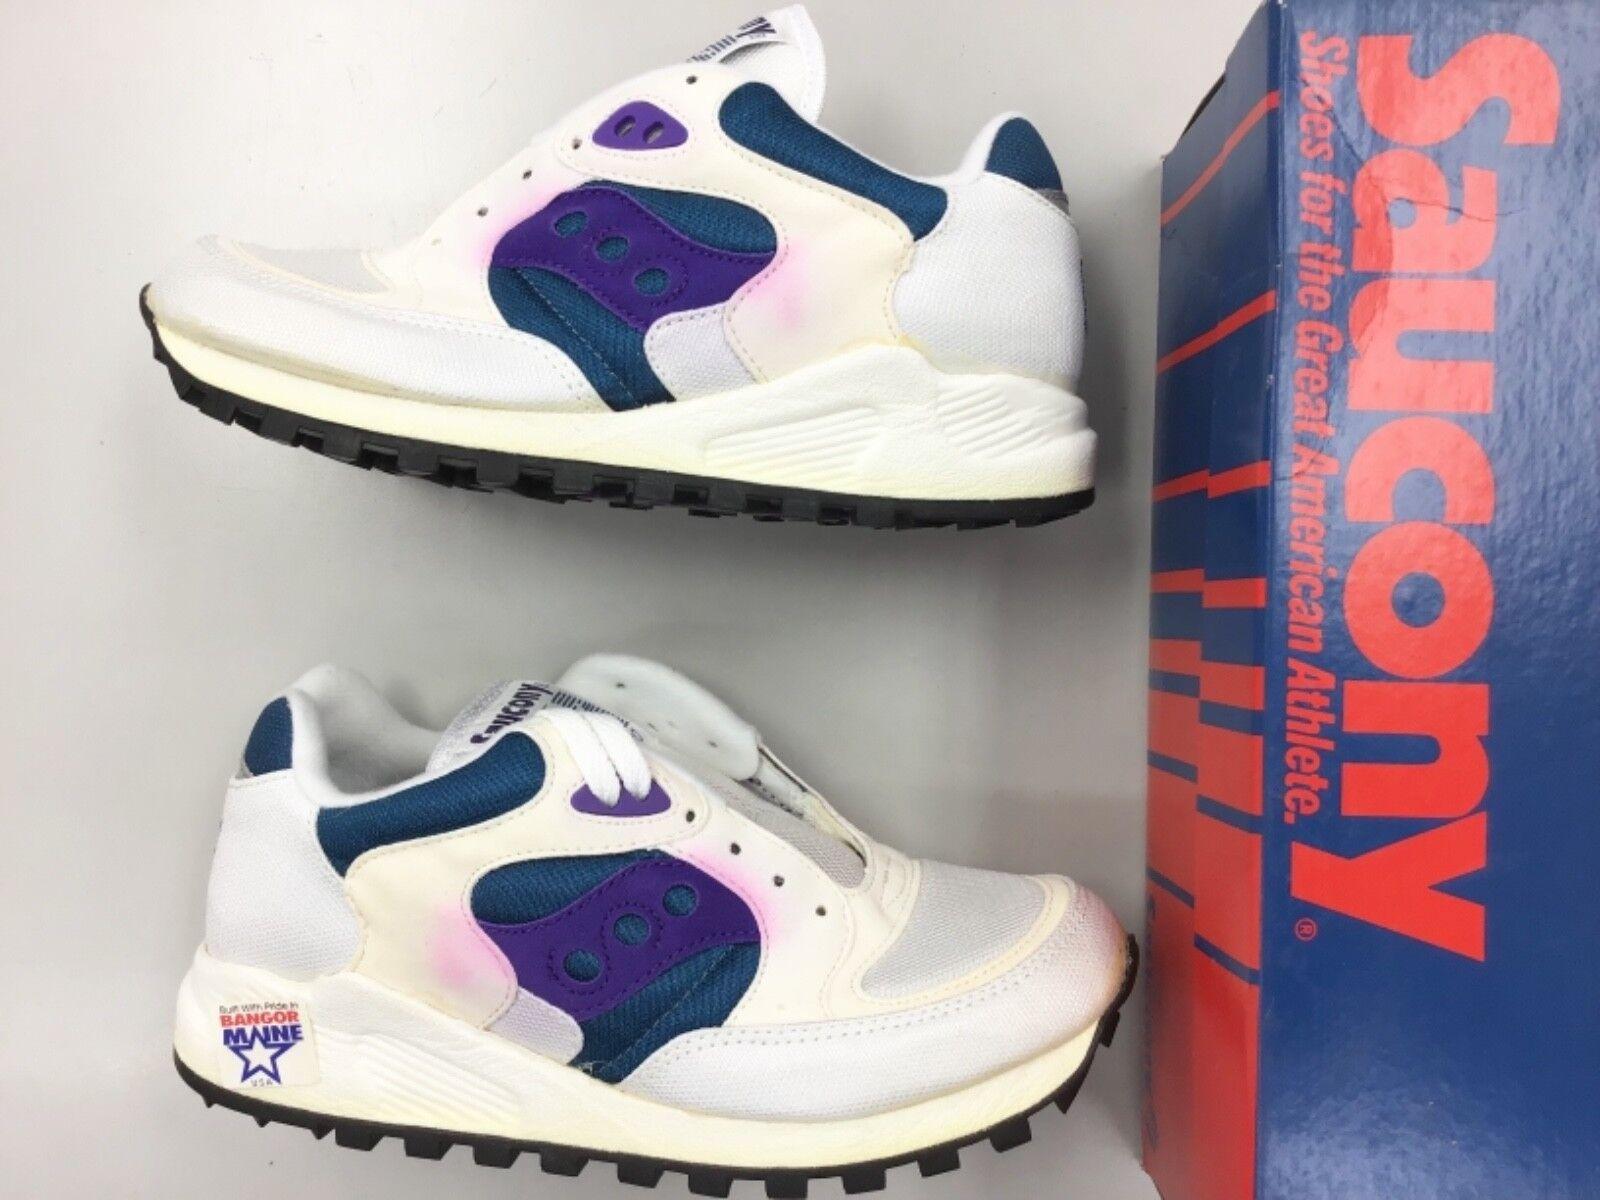 size 40 bad12 b41fa Vintage 90 s Saucony Jazz 4000 bianca Berry blu donna running running  running scarpe 59a87c